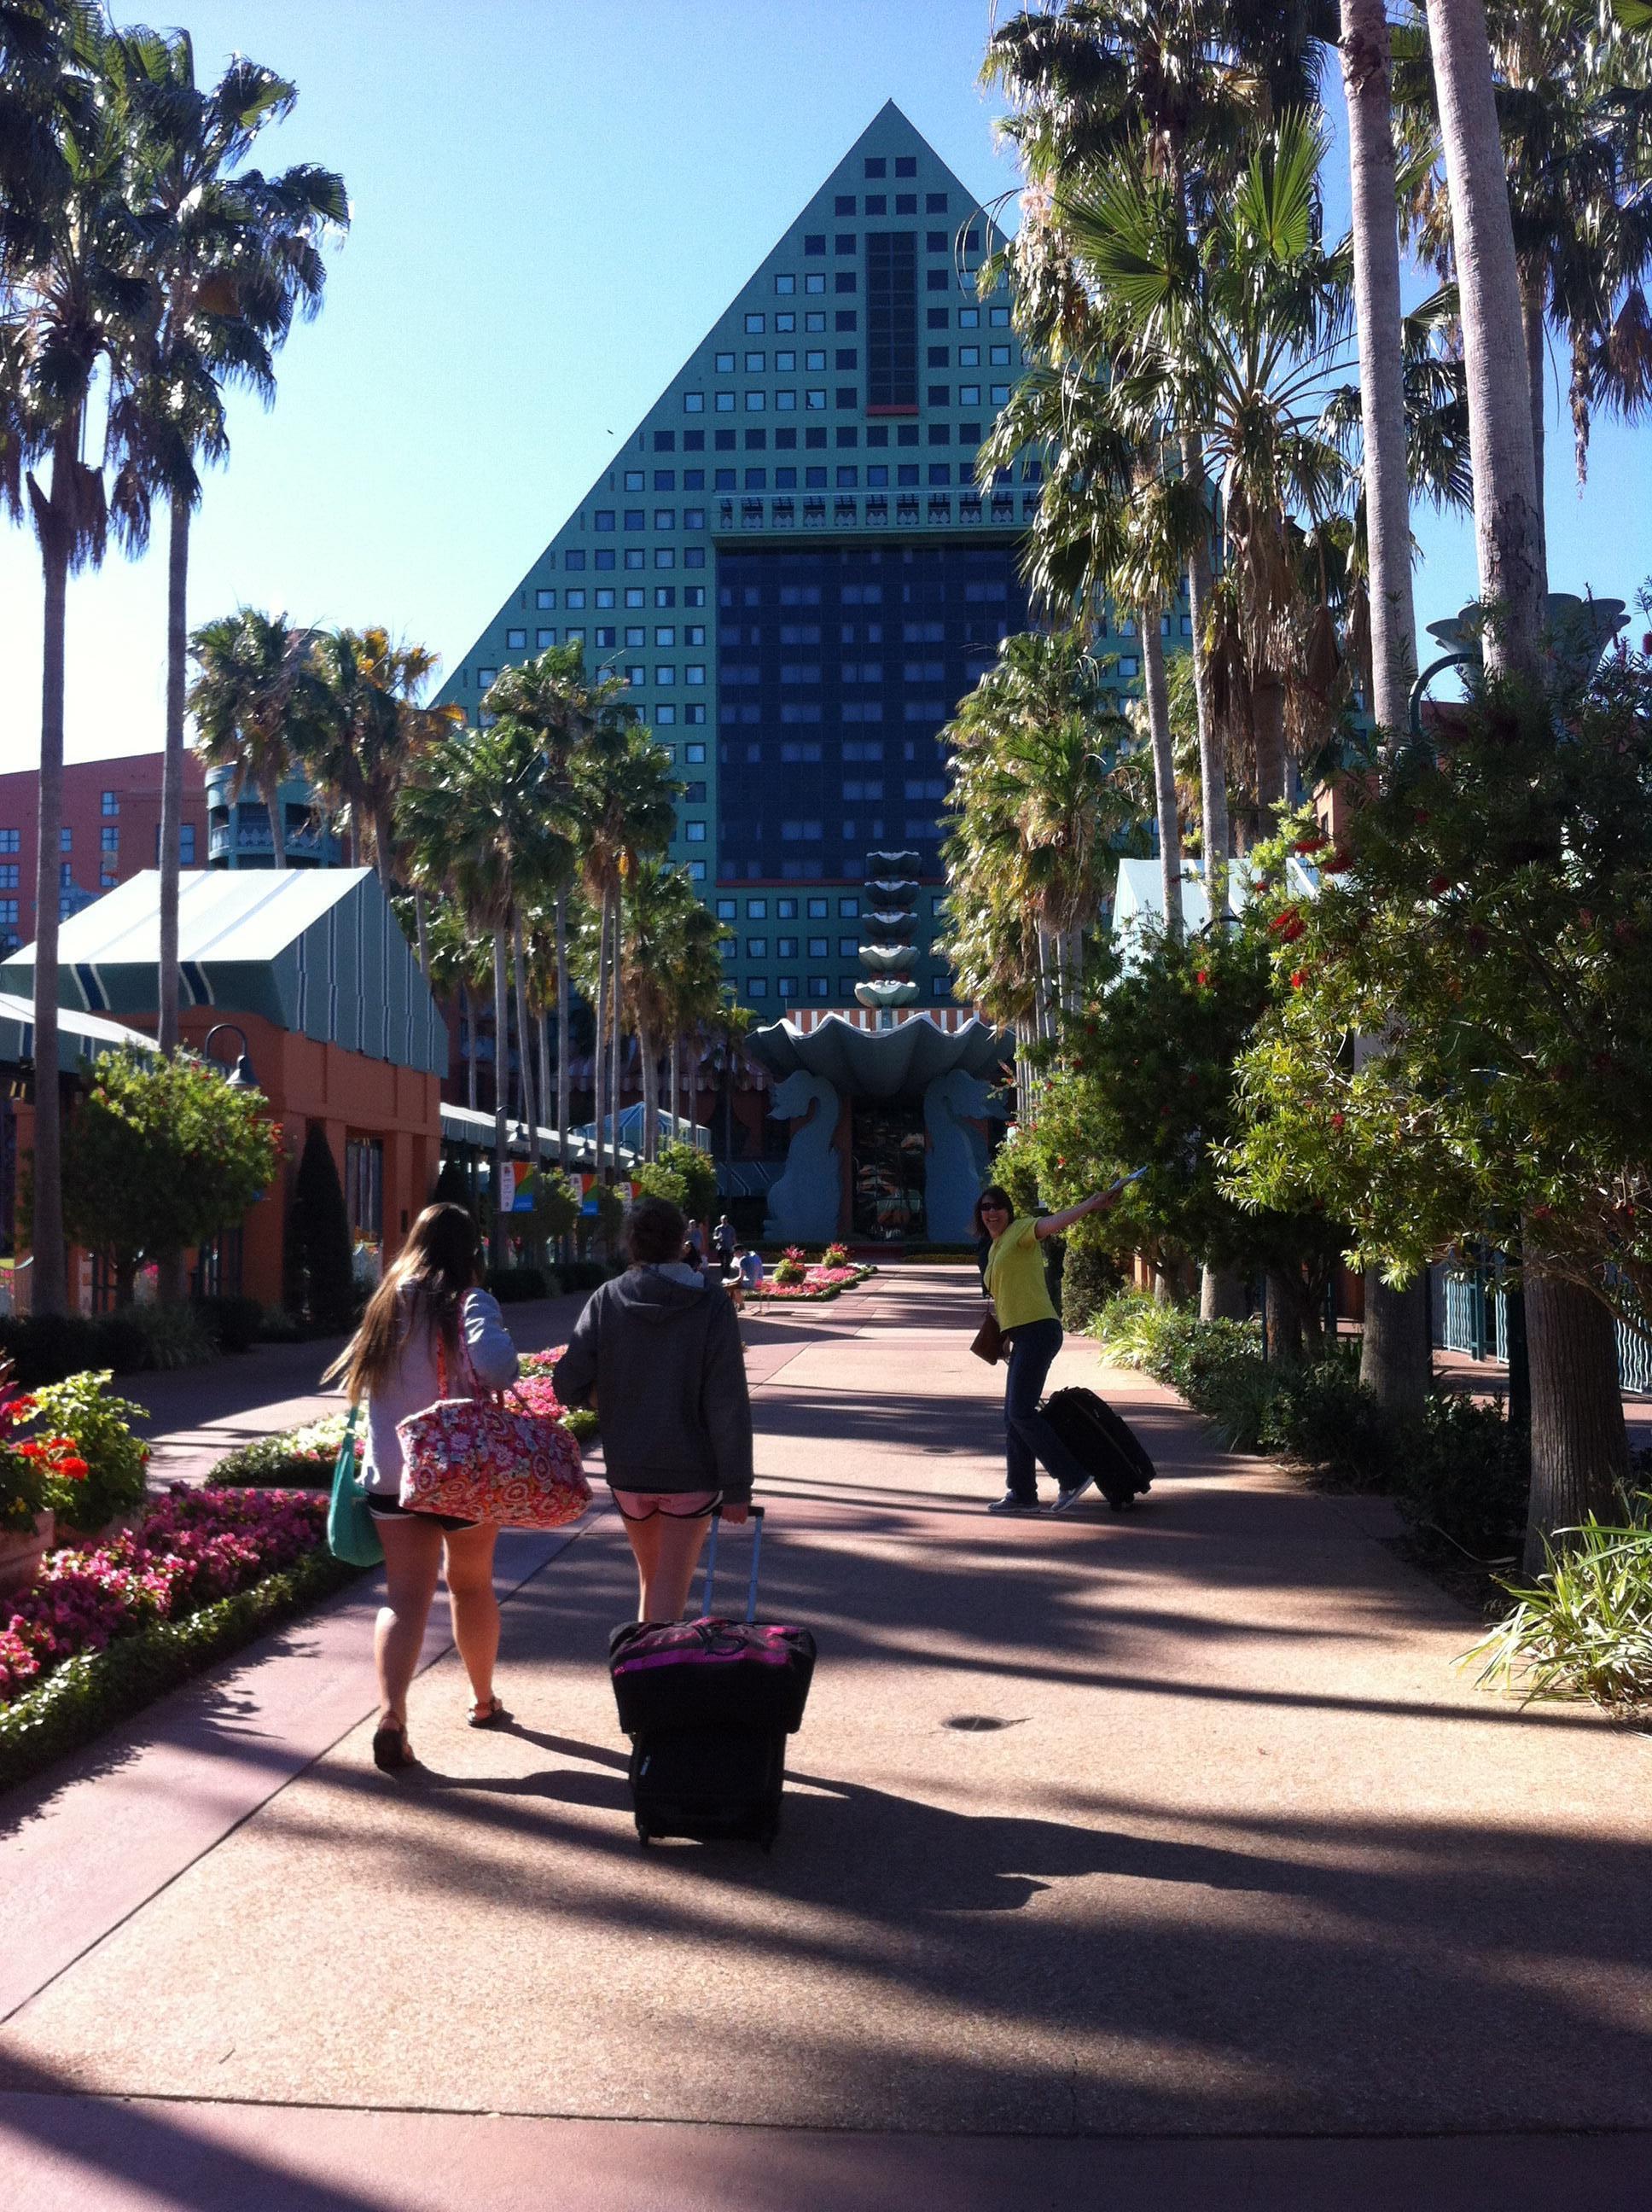 Hotel through travelocity